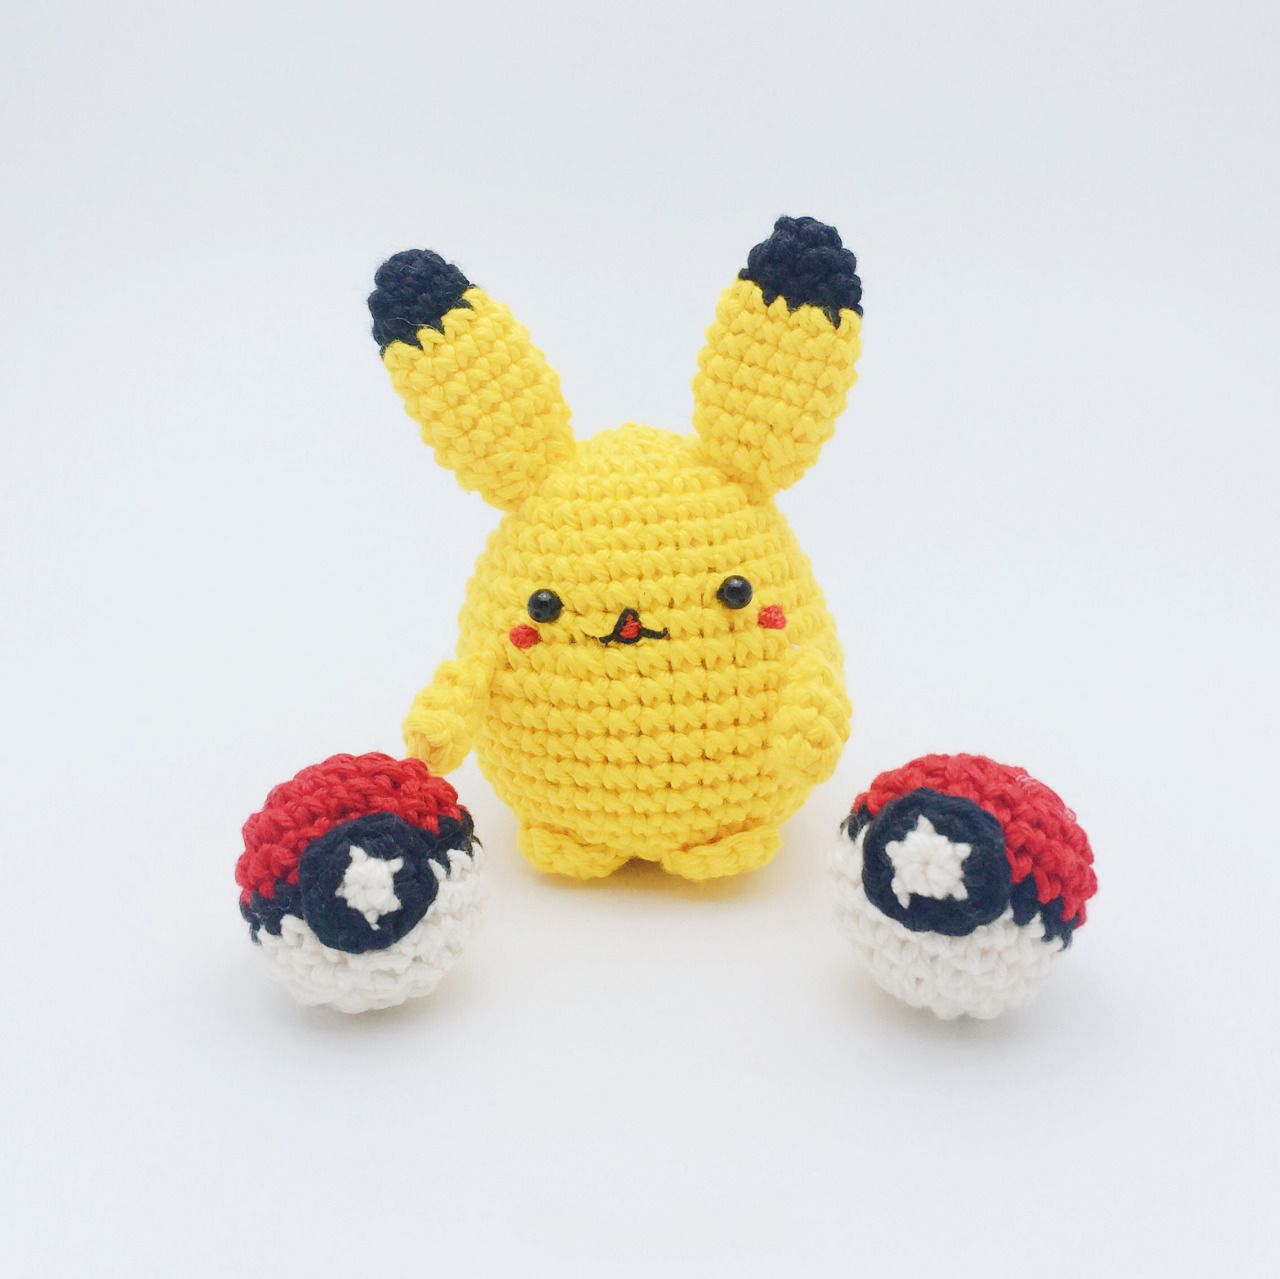 http://meemanan.com/post/148779535867/pattern-crochet-the-pokemon-go-materials-1